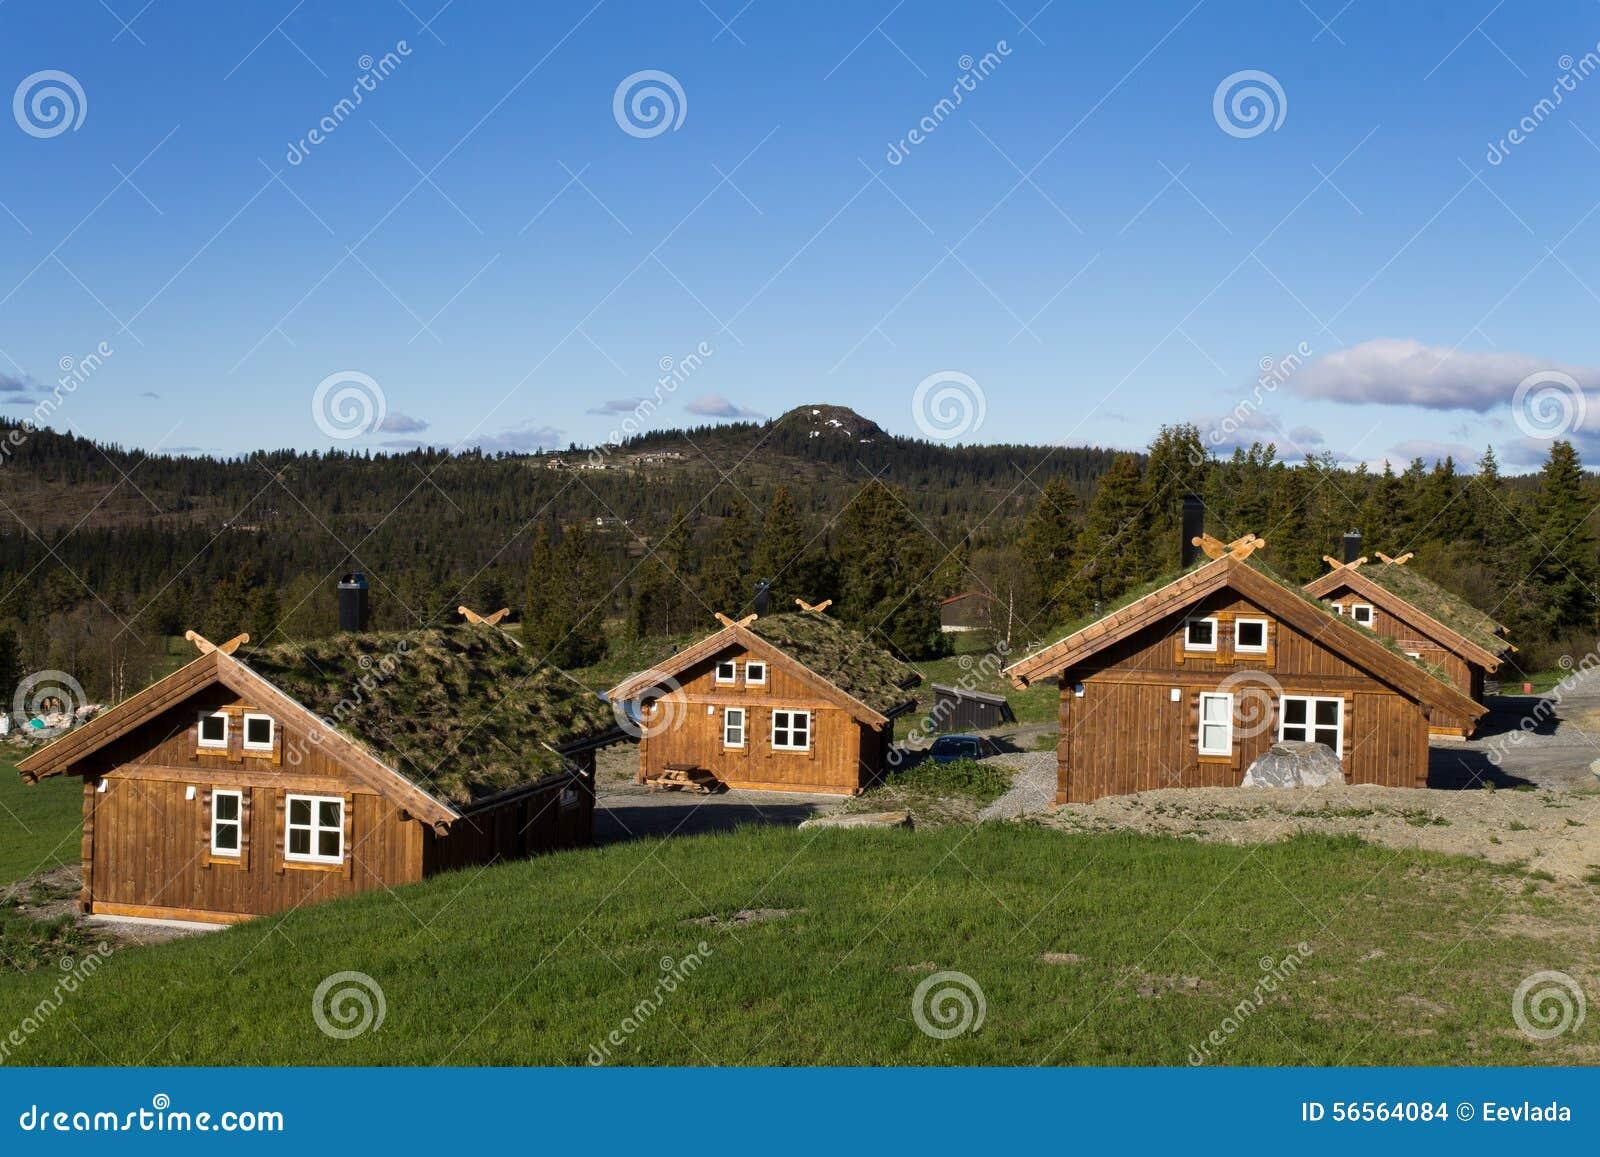 Download Σκανδιναβικά σπίτια στα βουνά Στοκ Εικόνες - εικόνα από κούτσουρα, δάσος: 56564084